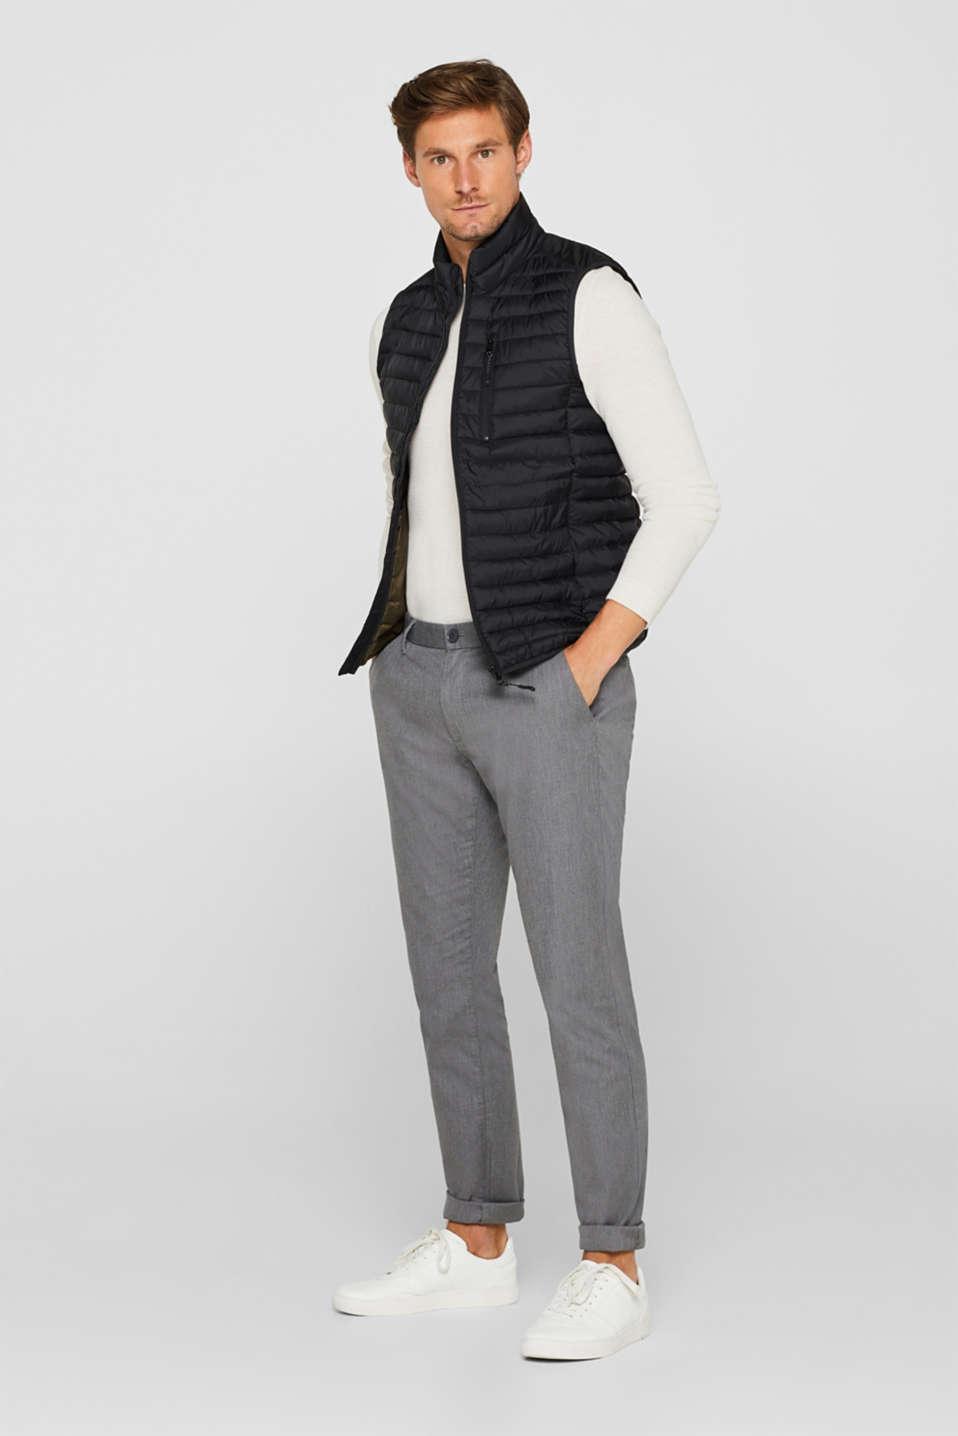 Pants woven Slim fit, GREY, detail image number 1